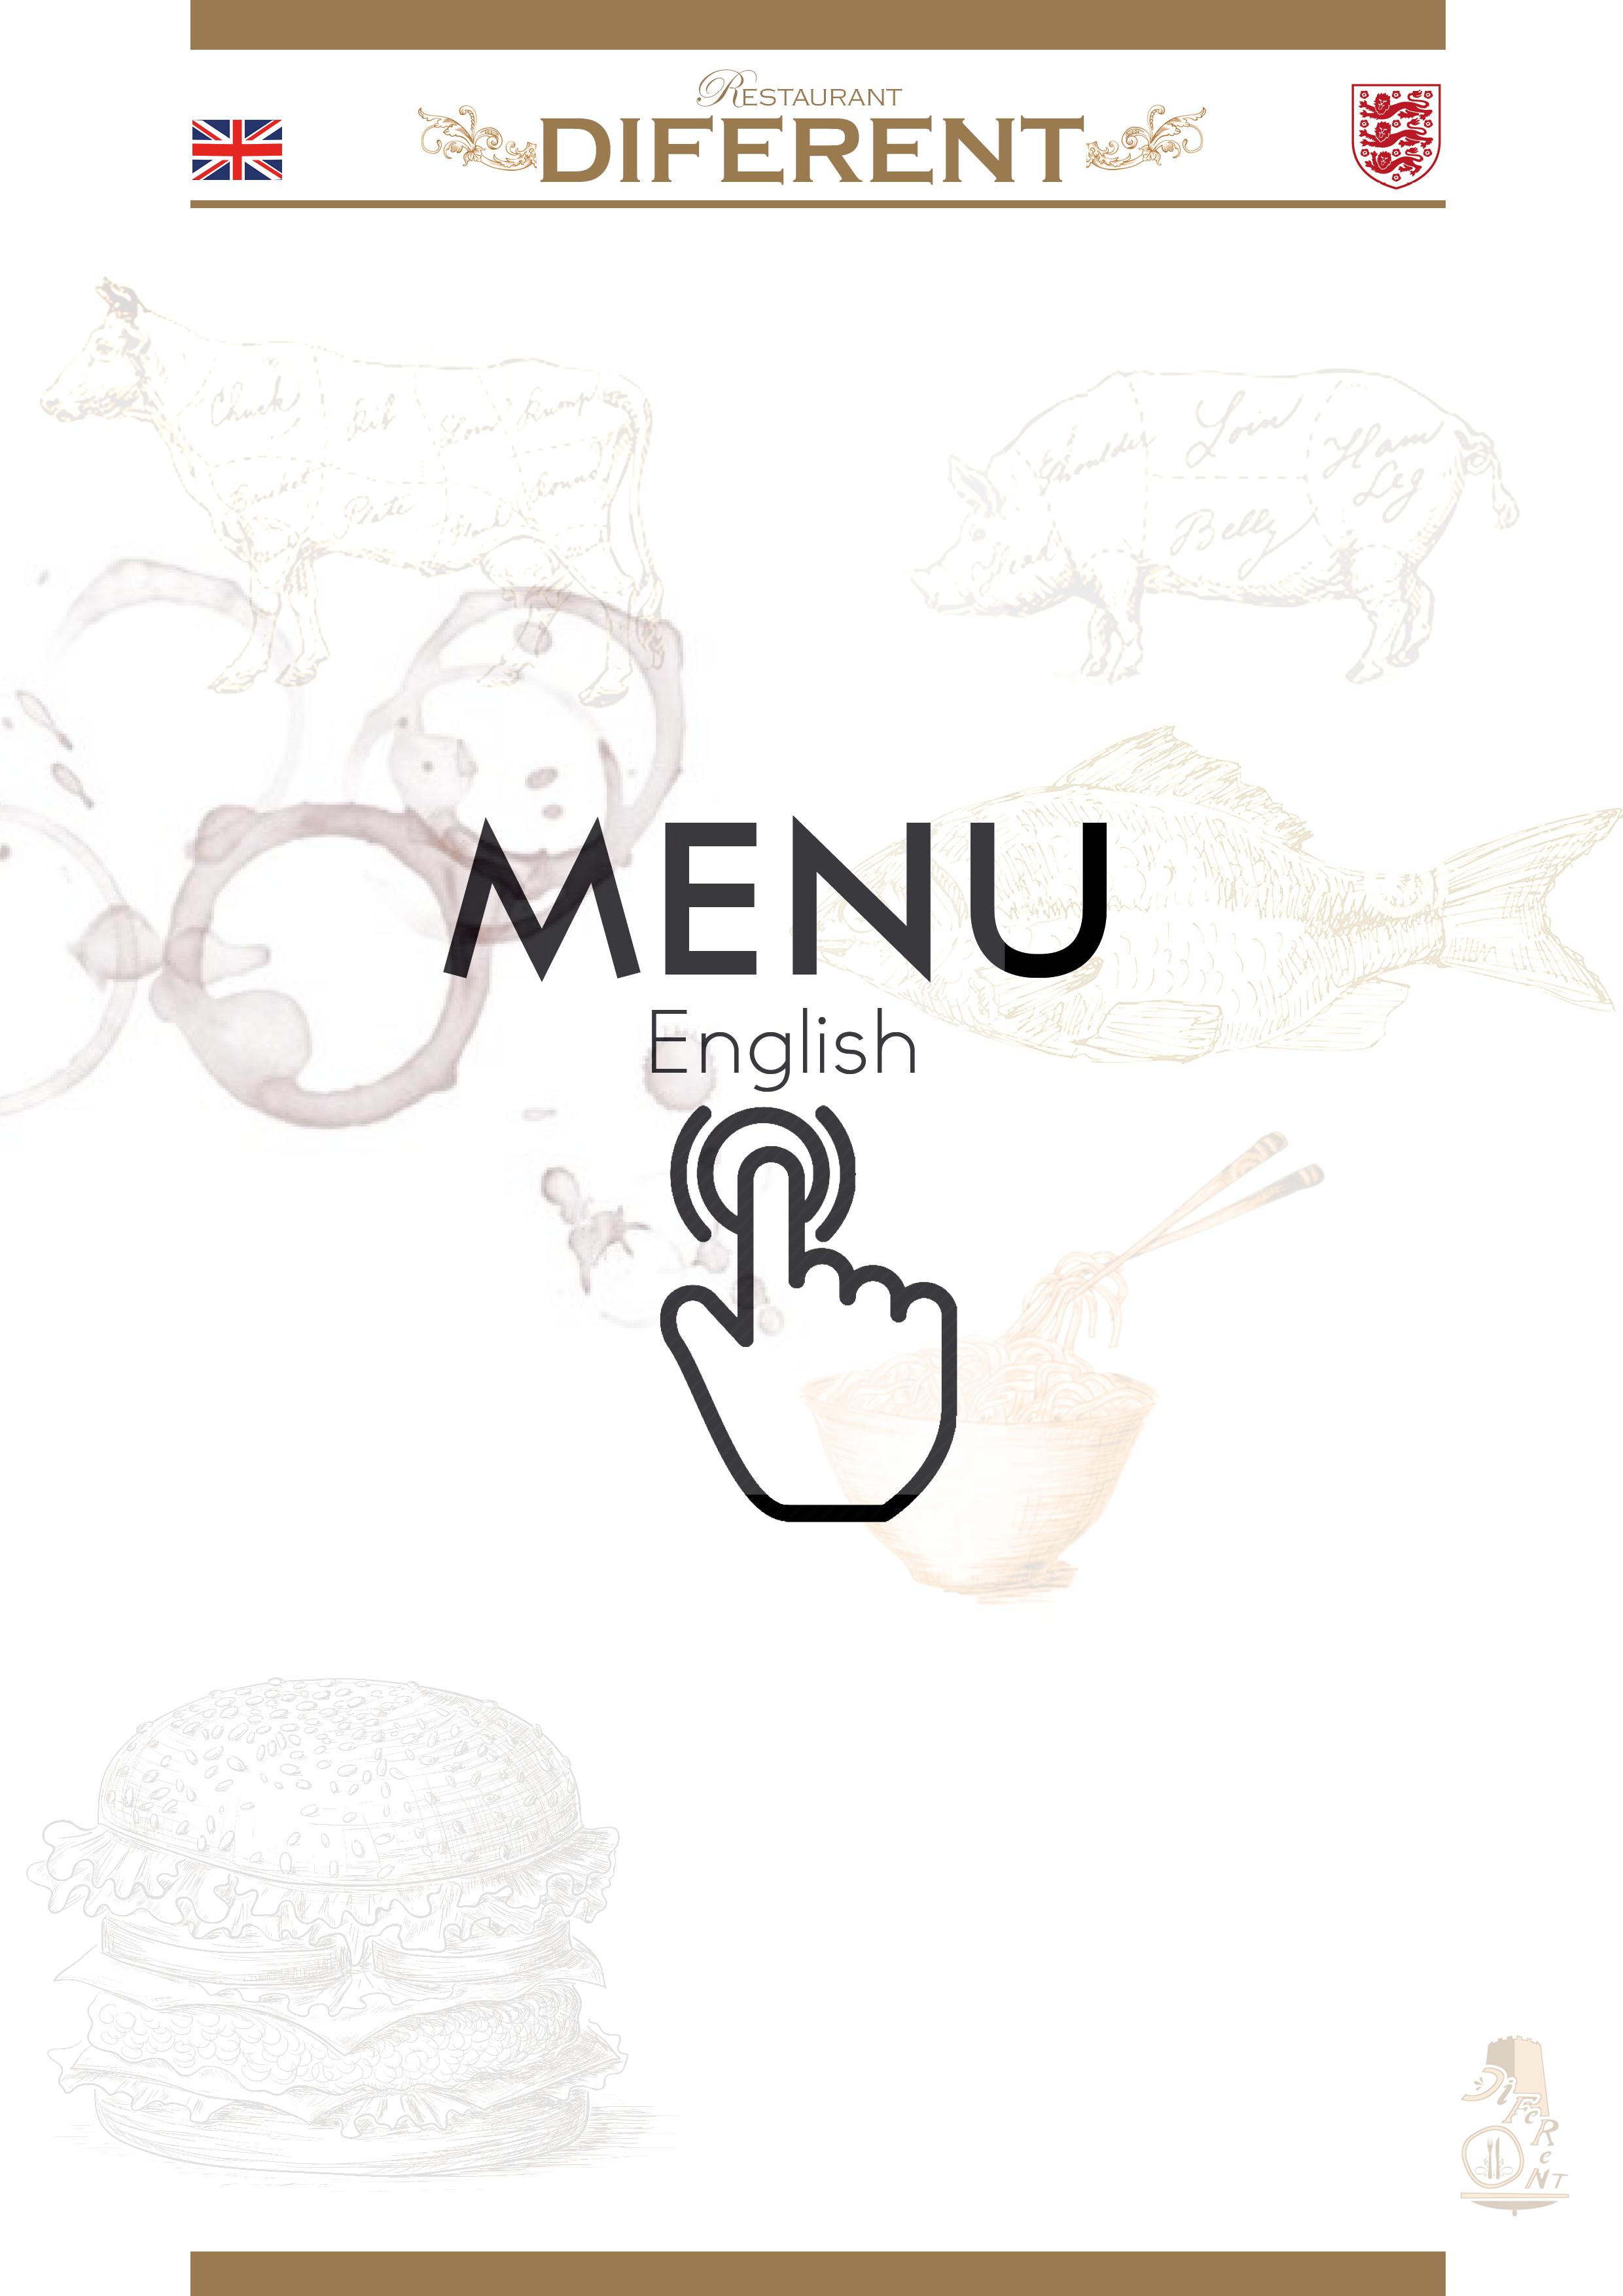 diferent_menu_EN_no_prices